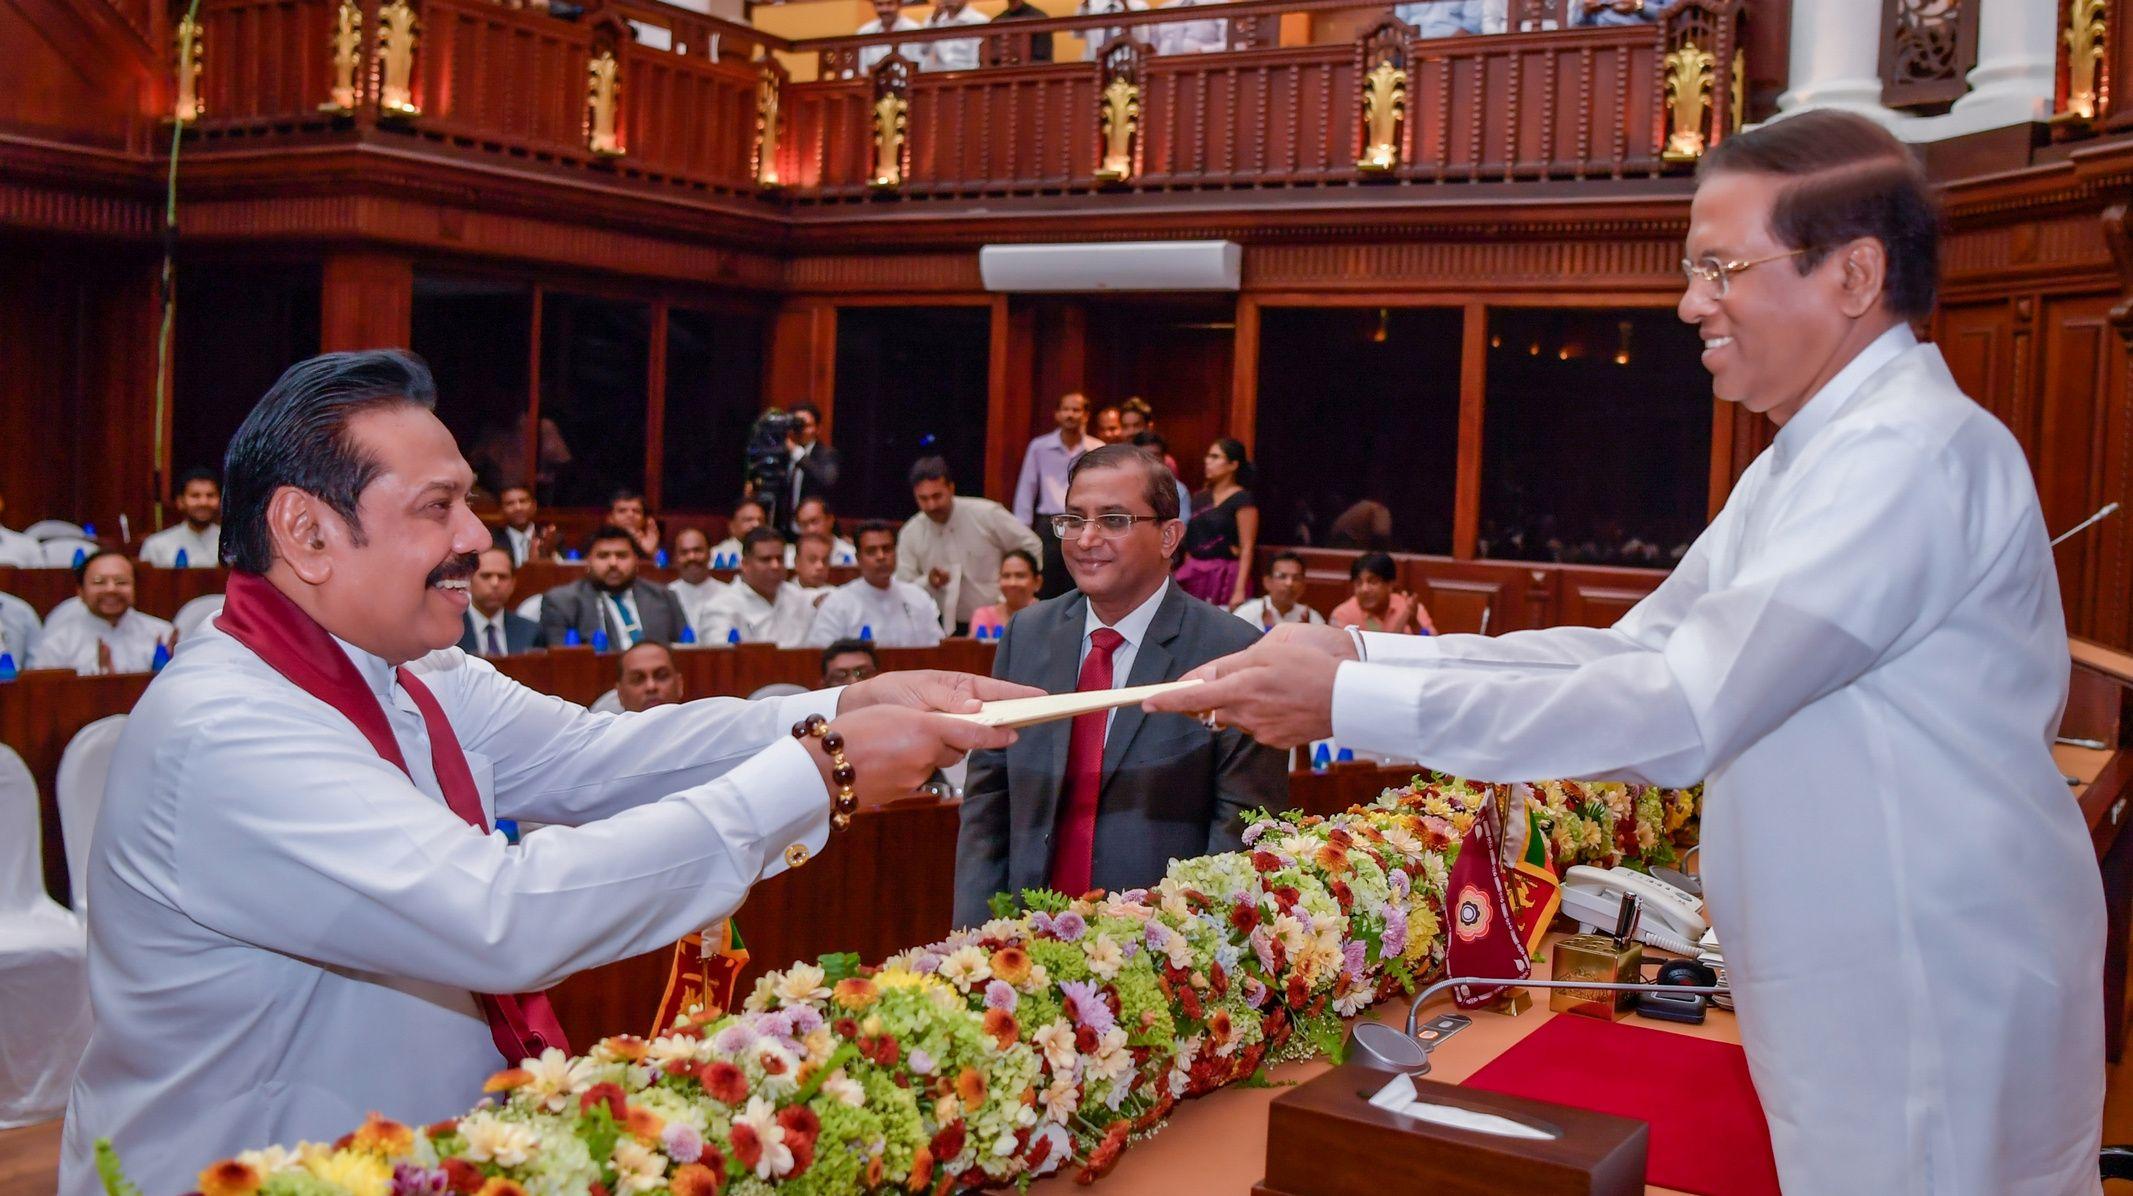 BIG STORY, SMALL COUNTRY: SRI LANKA'S POLITICAL CRISIS